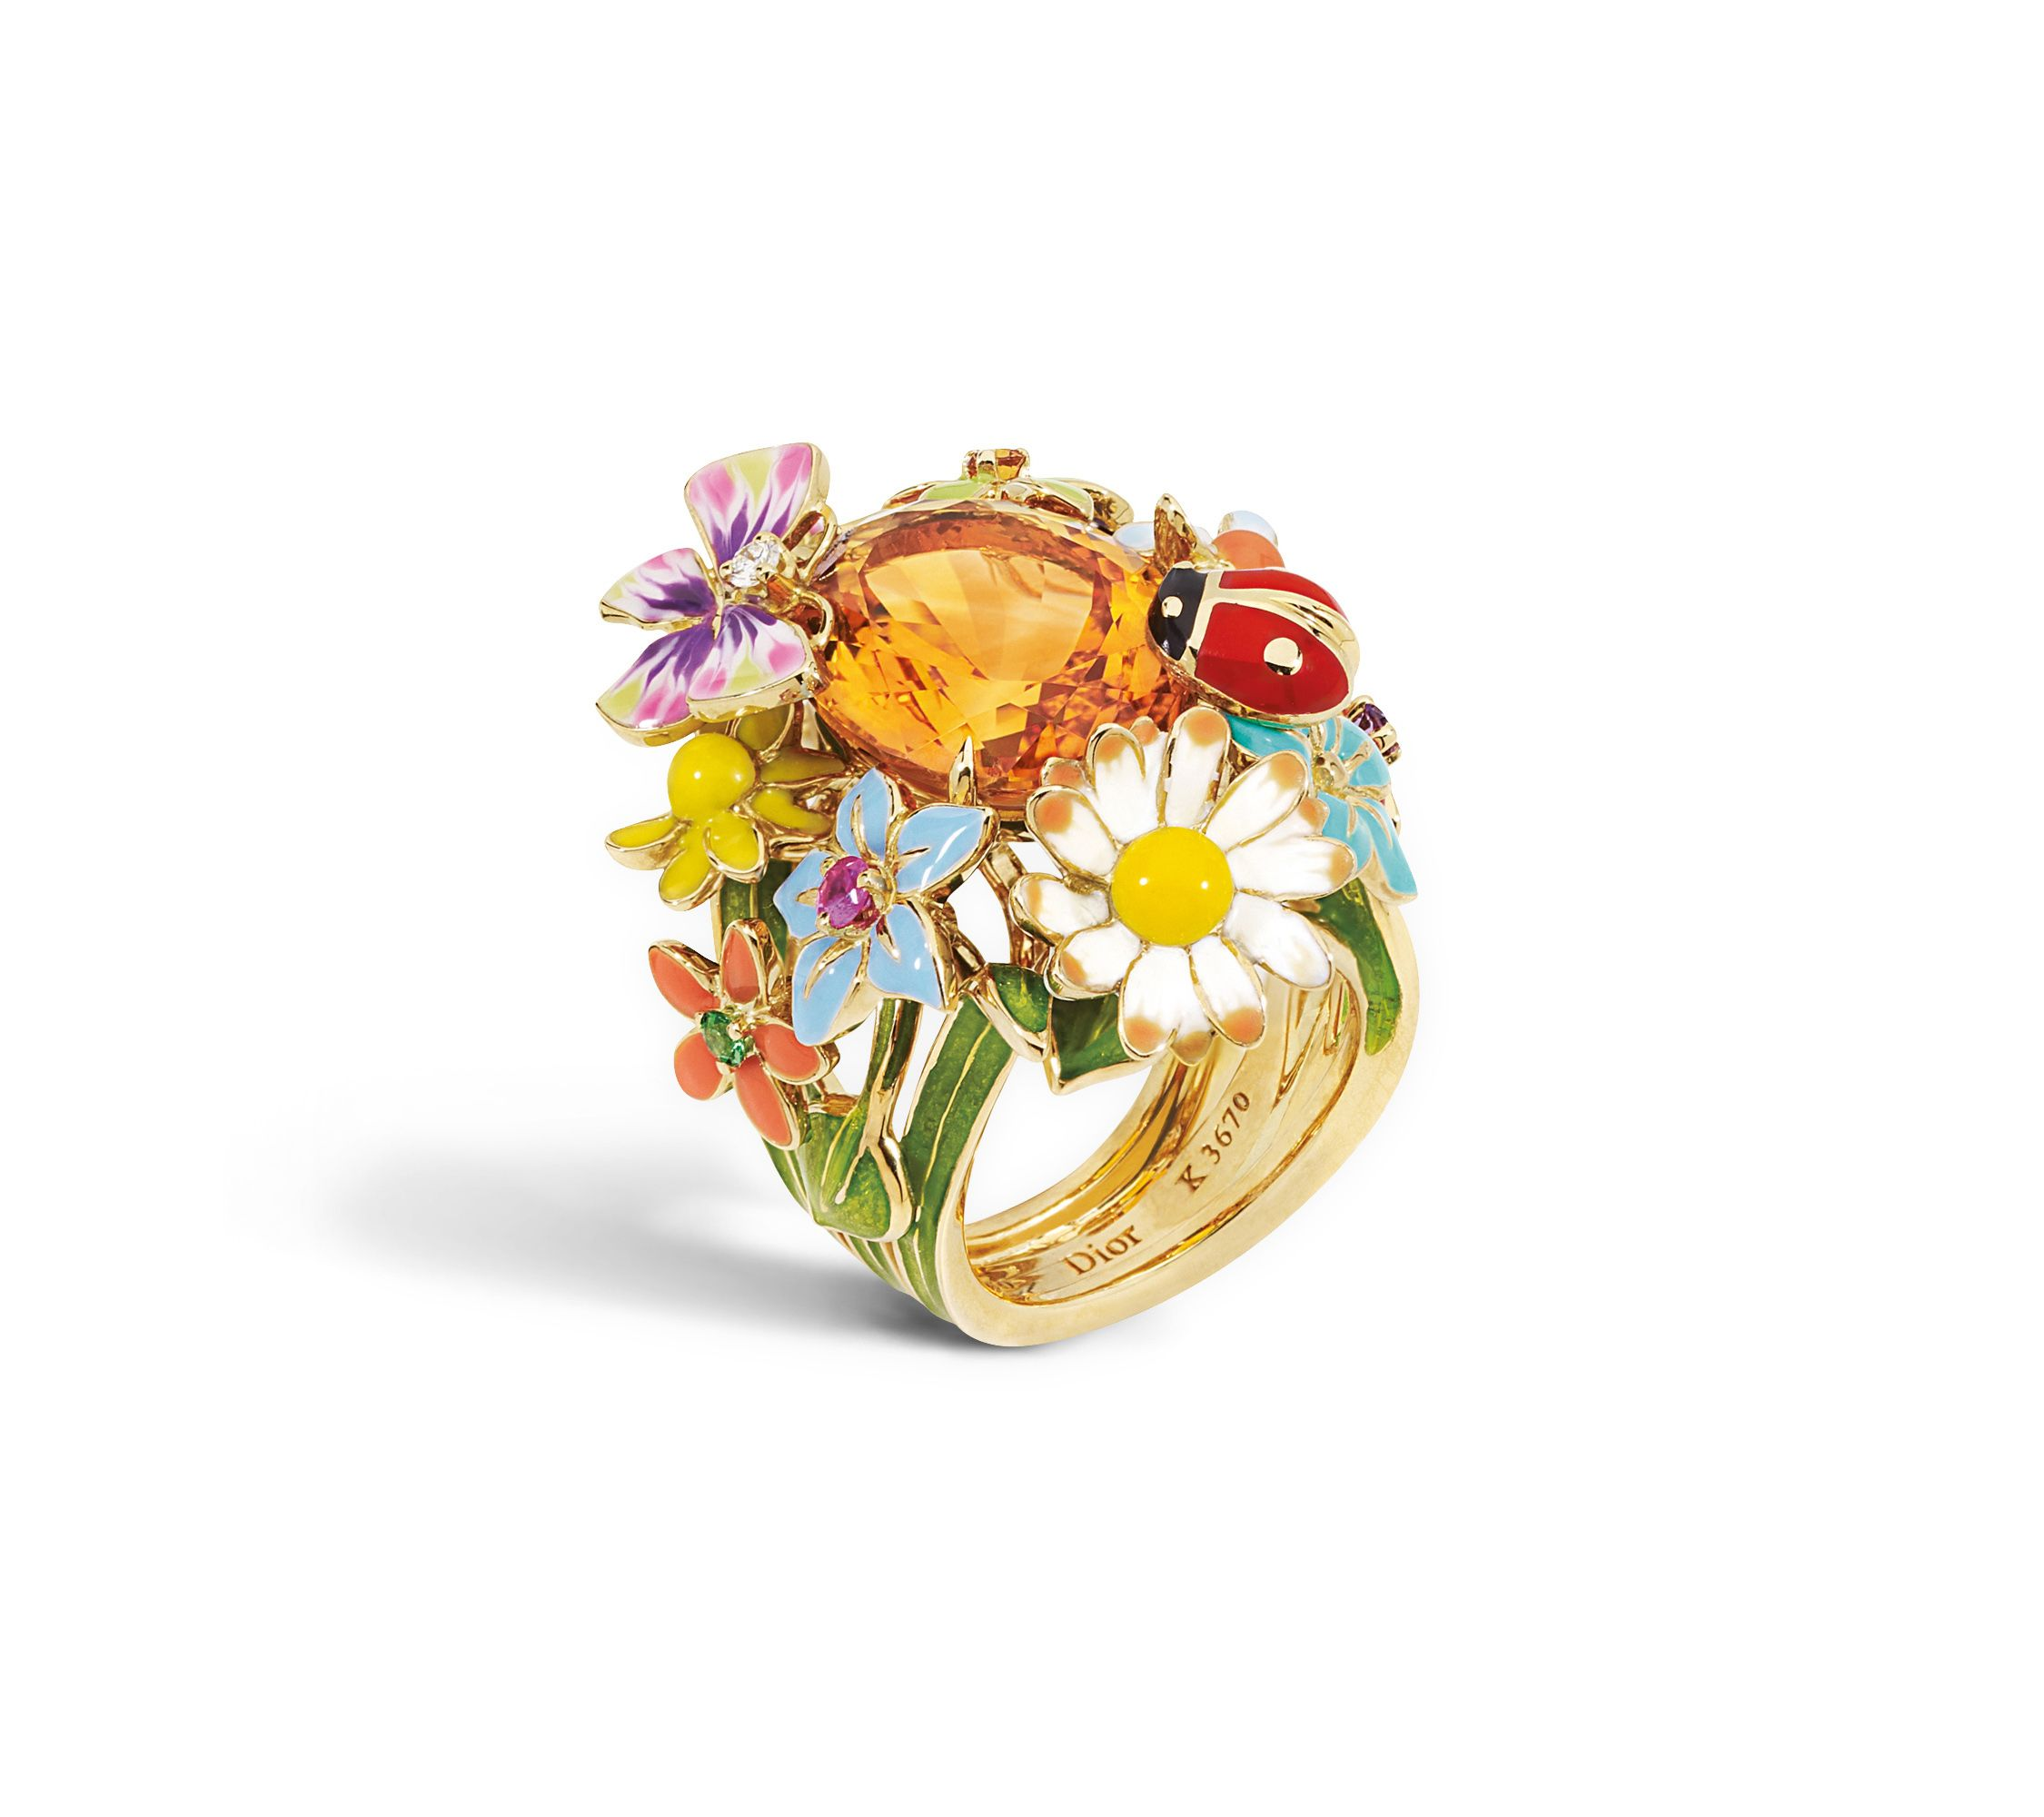 "Bague Dior Collection ""Jardin de Milly La Forêt"" Gold"